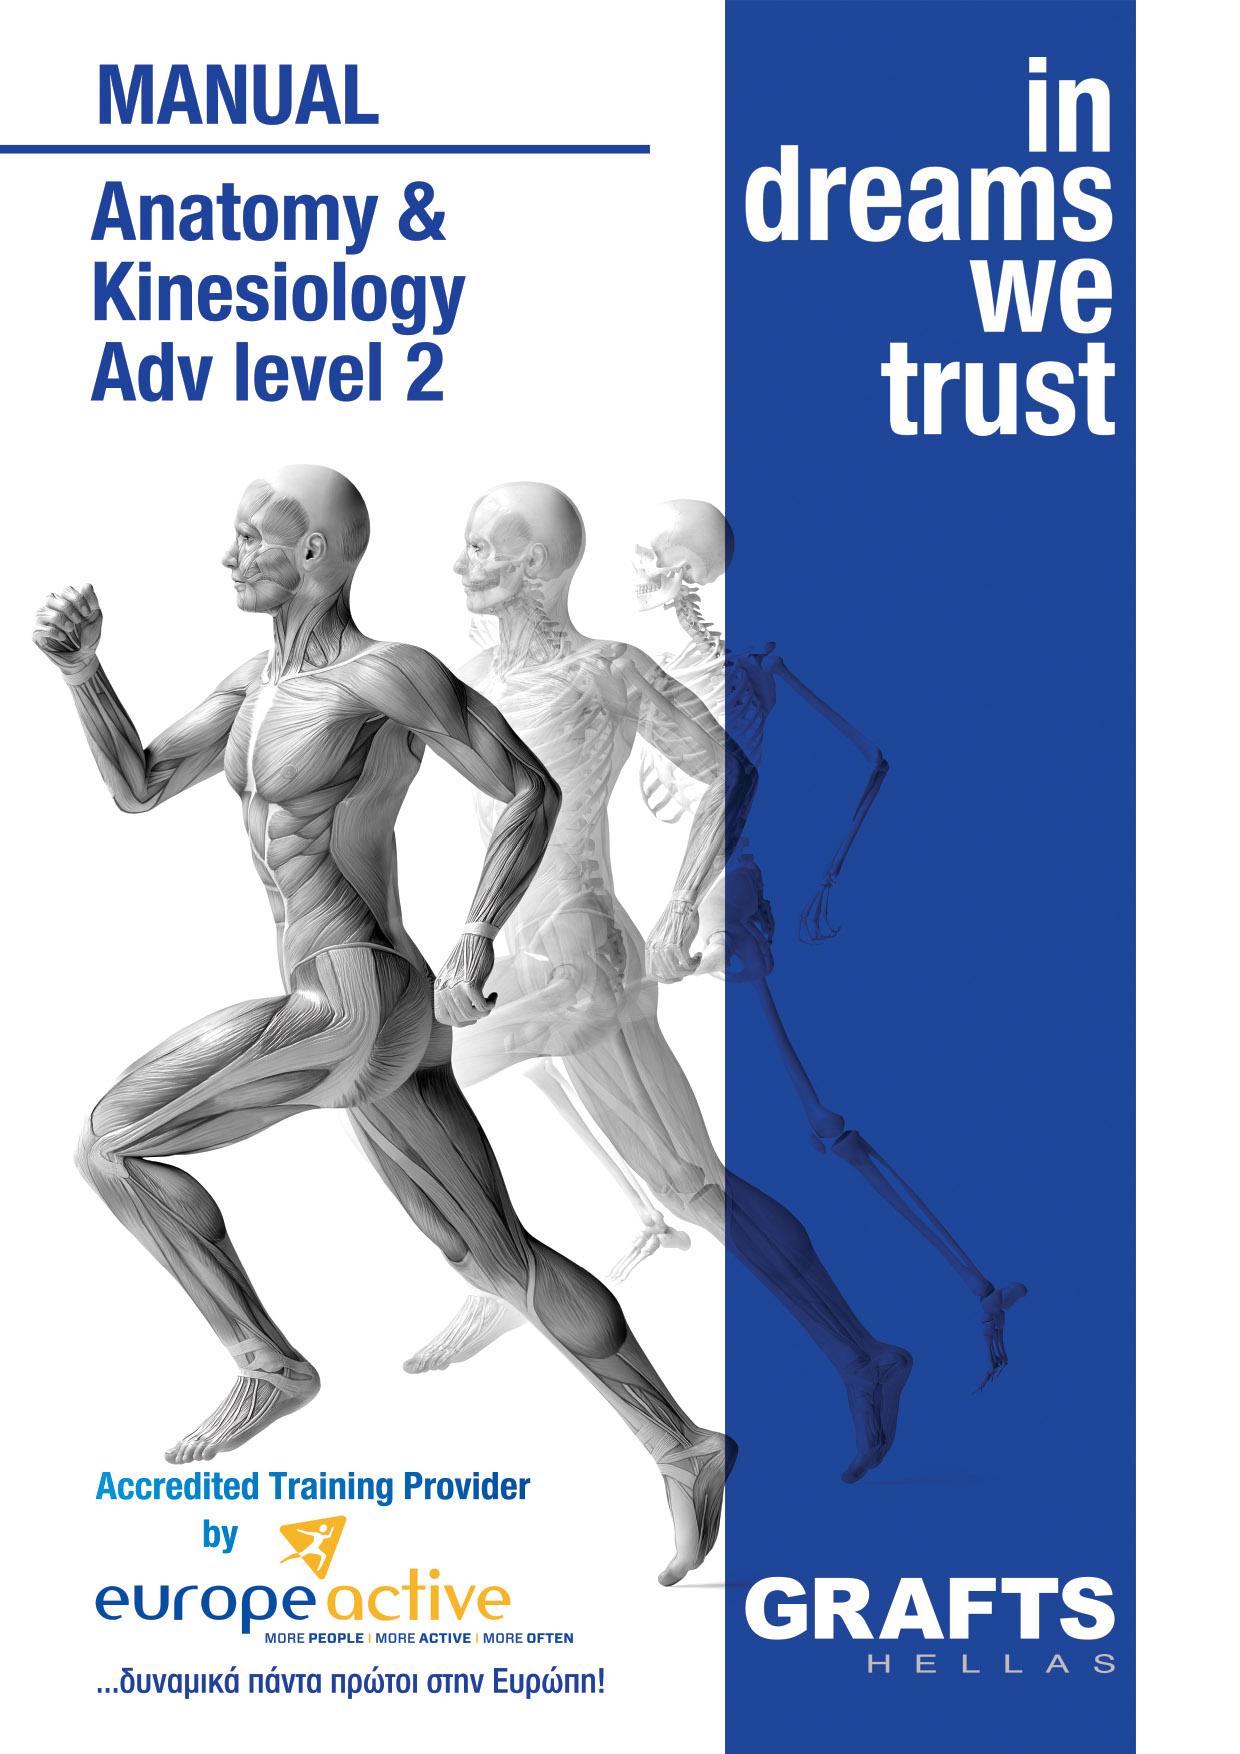 Grafts Hellas manual - Anatomy and Kinesiology - Adv Level 2